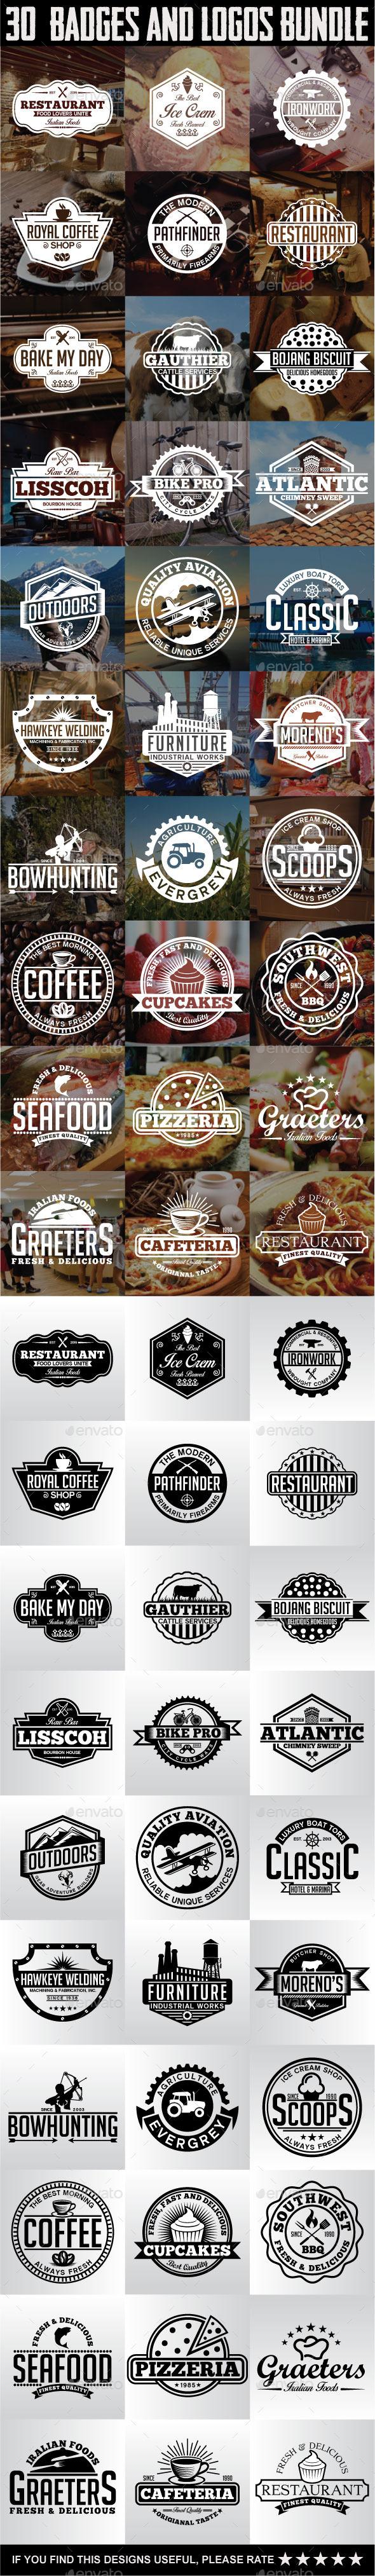 30 Badges and Logos Bundle - Badges & Stickers Web Elements